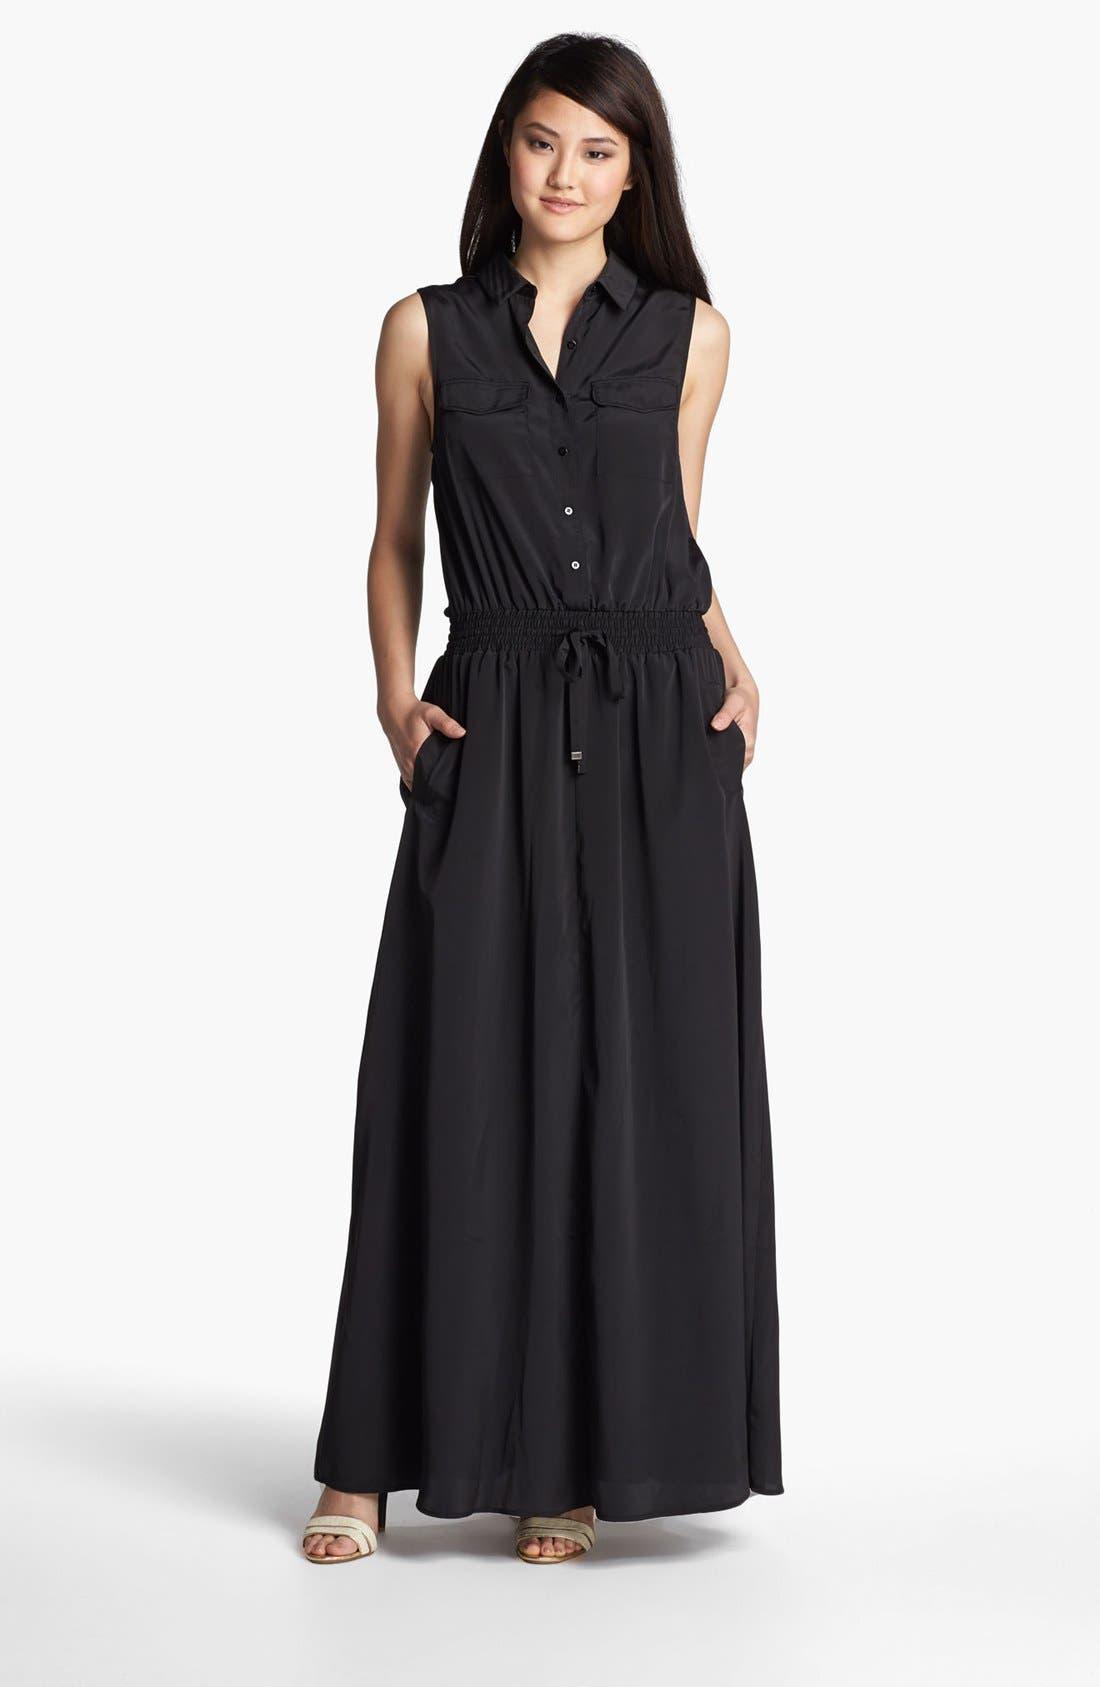 Main Image - Kenneth Cole New York 'Eden' Maxi Dress